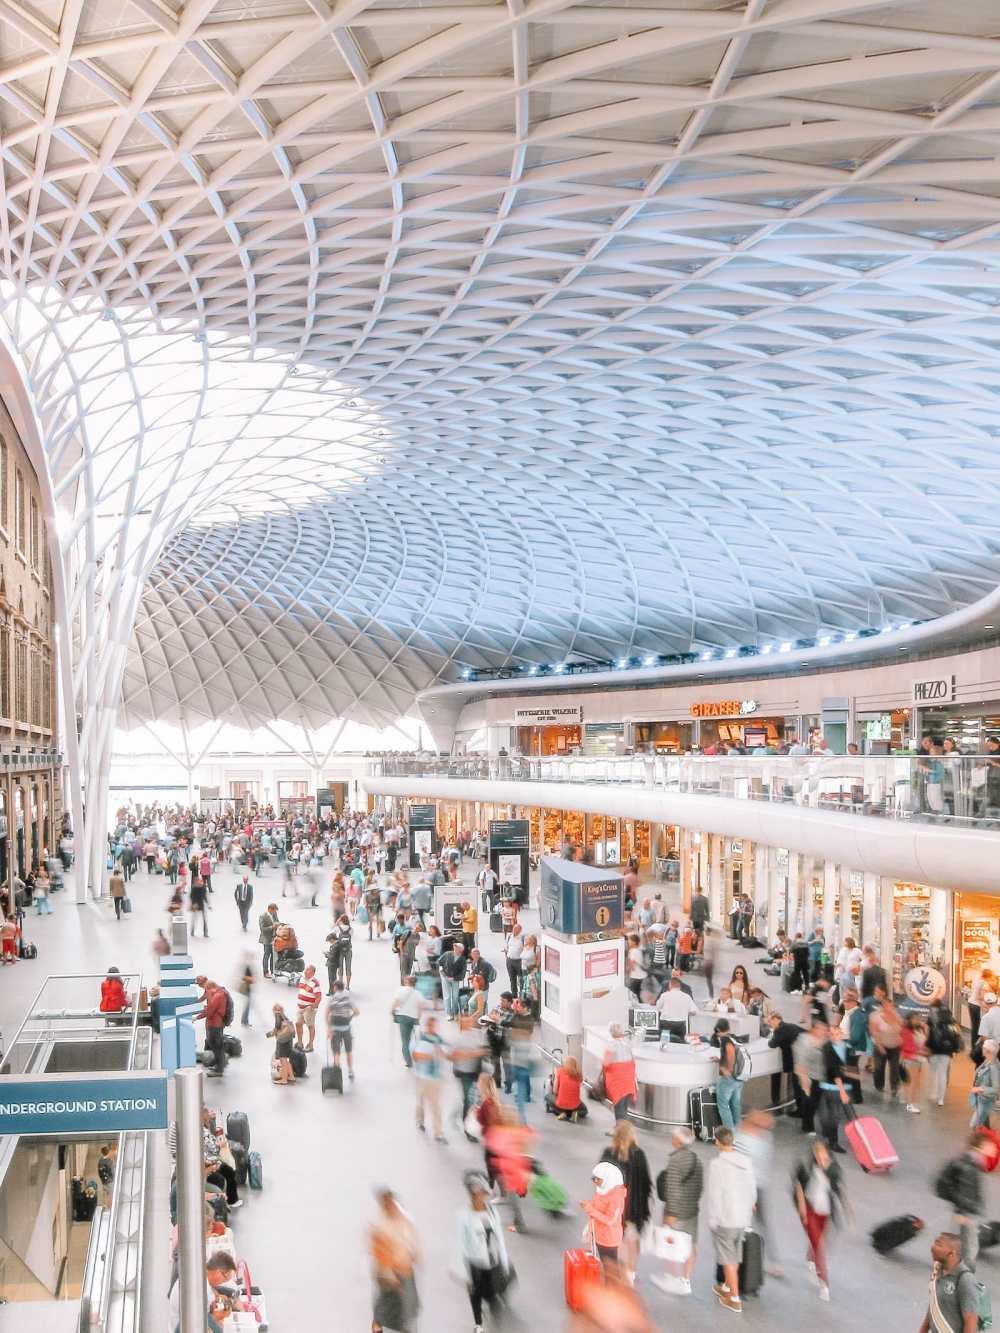 10 Best Things To Do In Kings Cross - London (15)